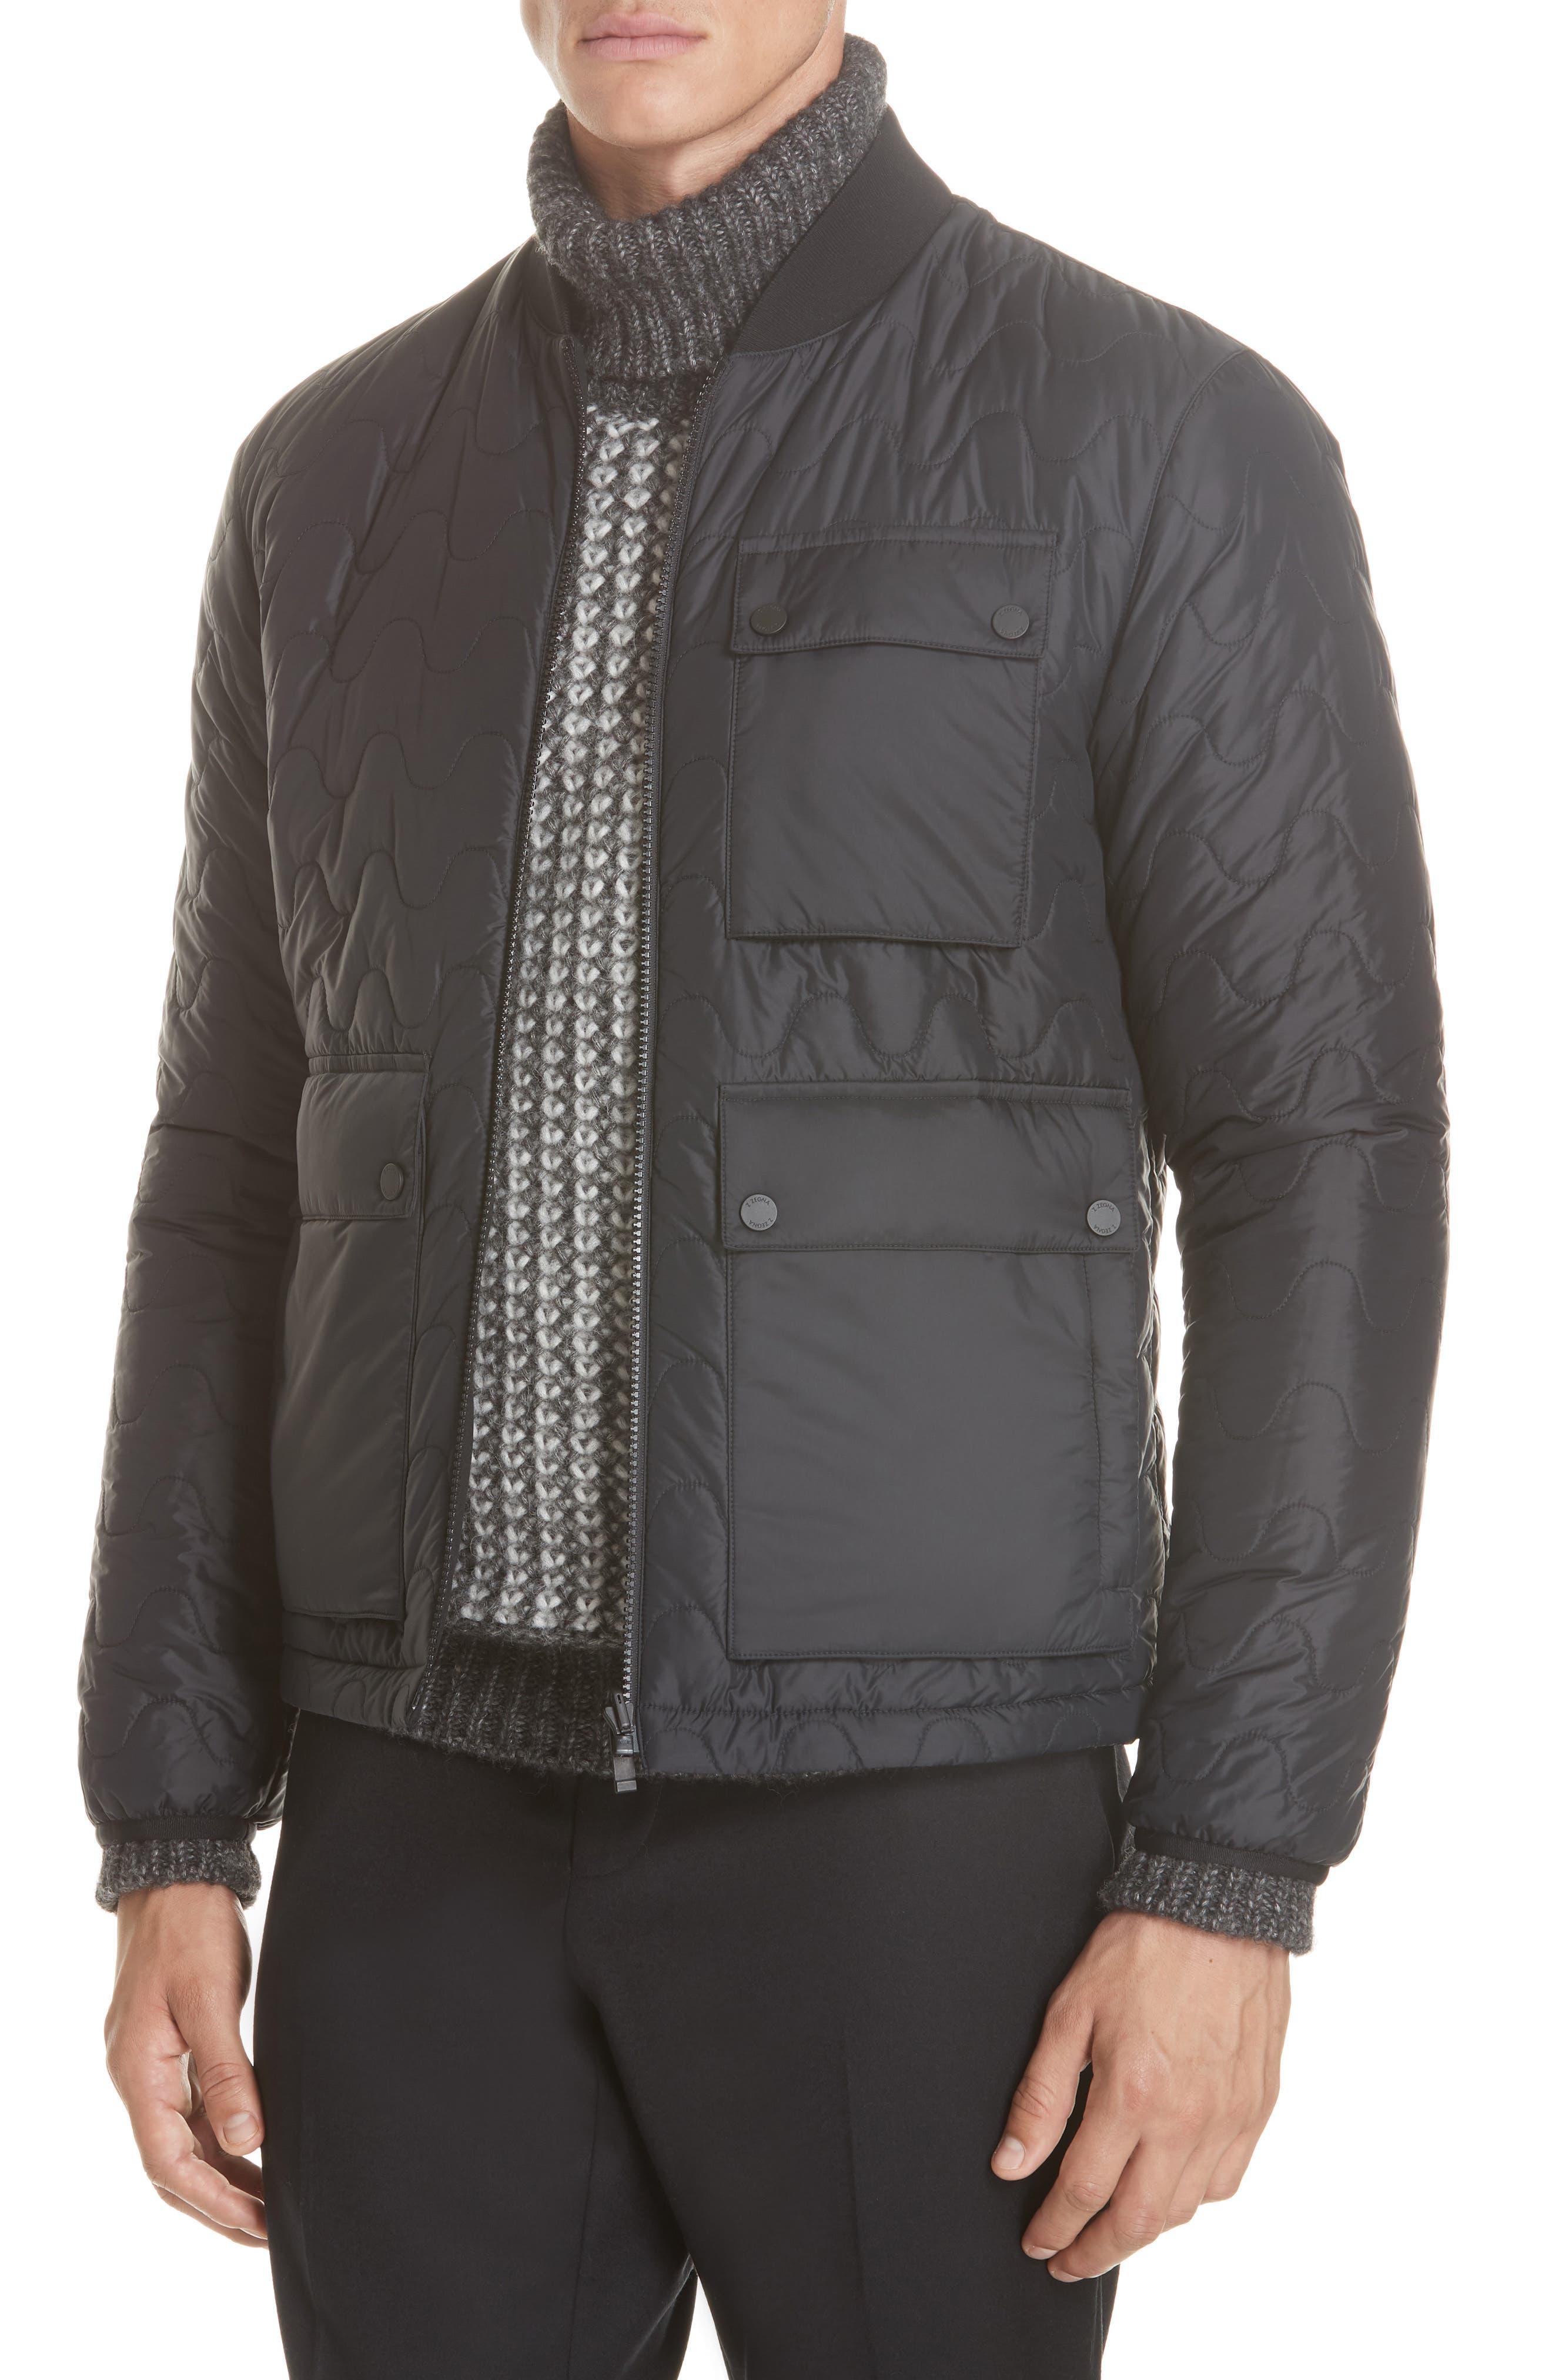 Z Zenga Trim Fit 3-in-1 Jacket,                             Alternate thumbnail 2, color,                             BLACK